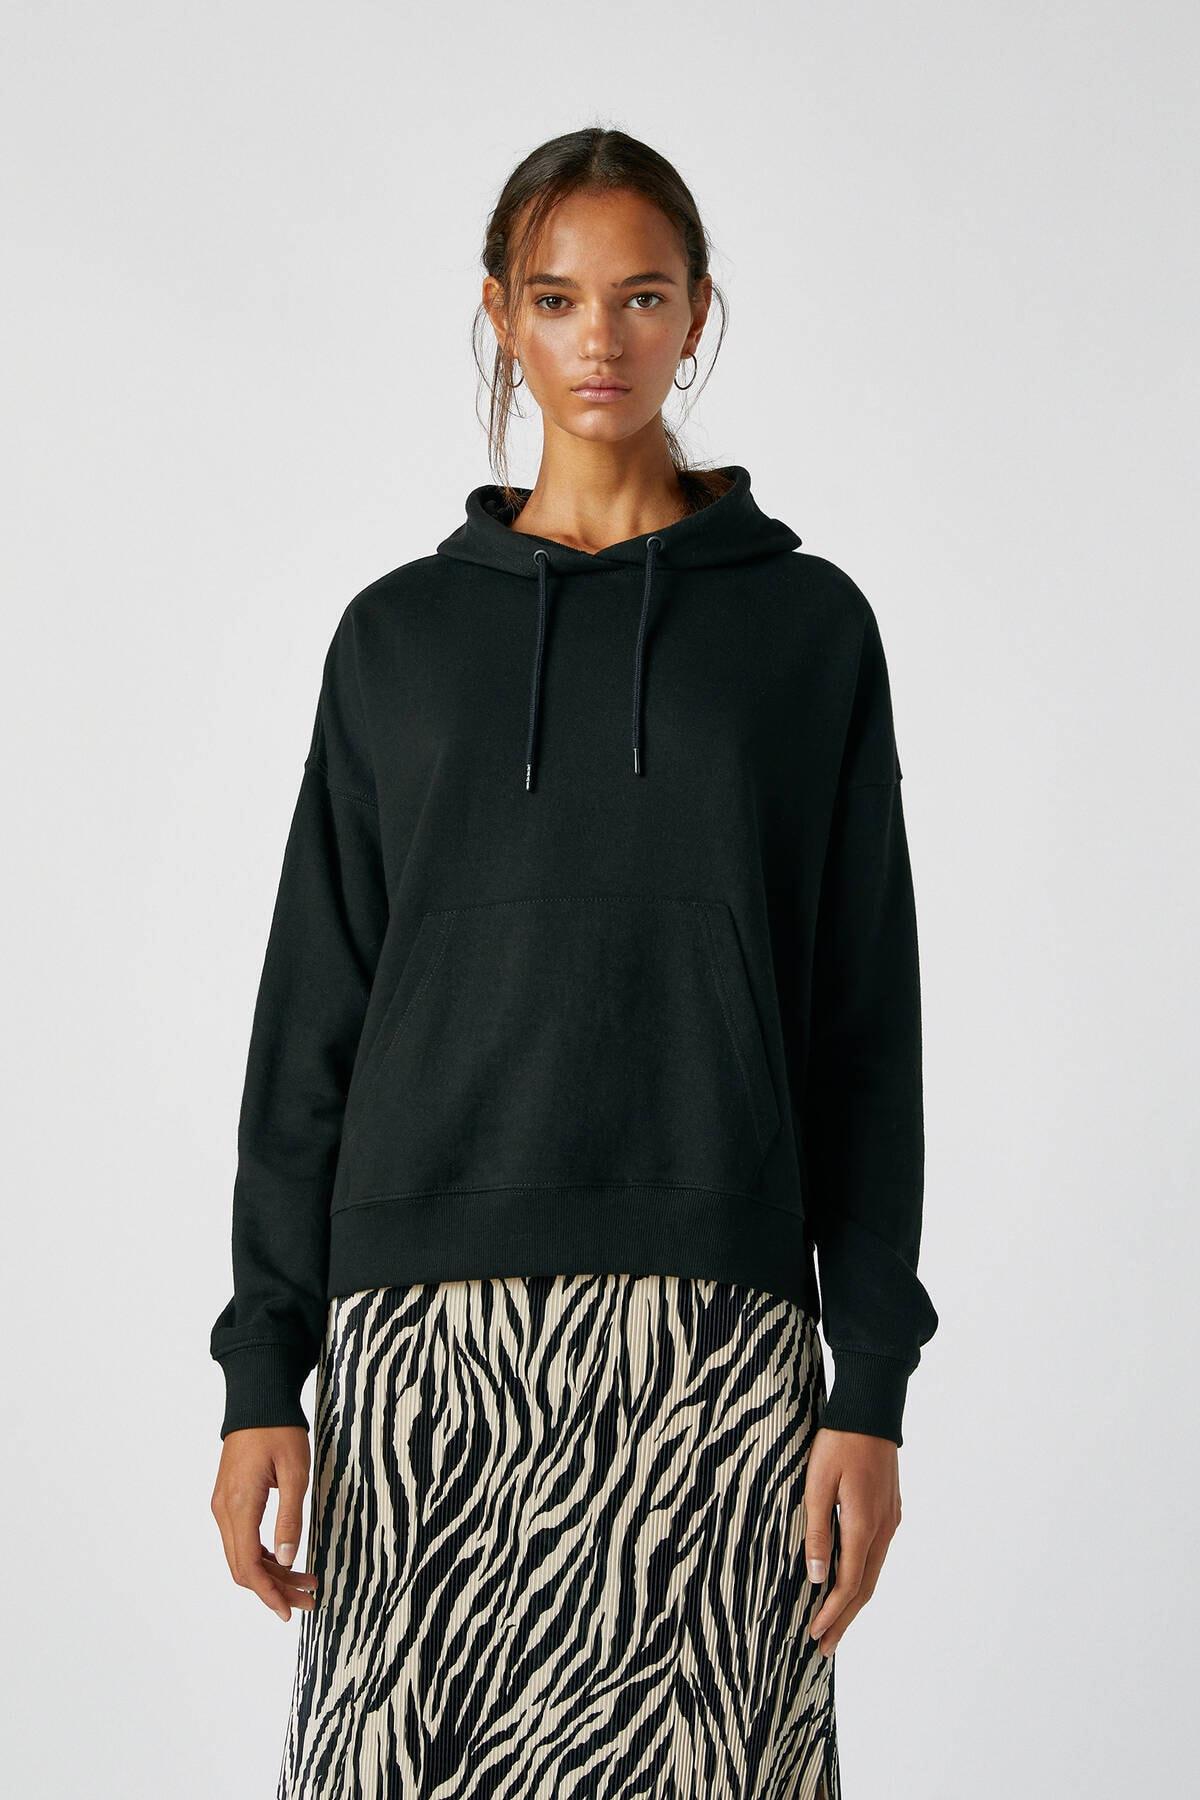 Pull & Bear Kadın Siyah Kanguru Cepli Kapüşonlu Sweatshirt 09594360 0